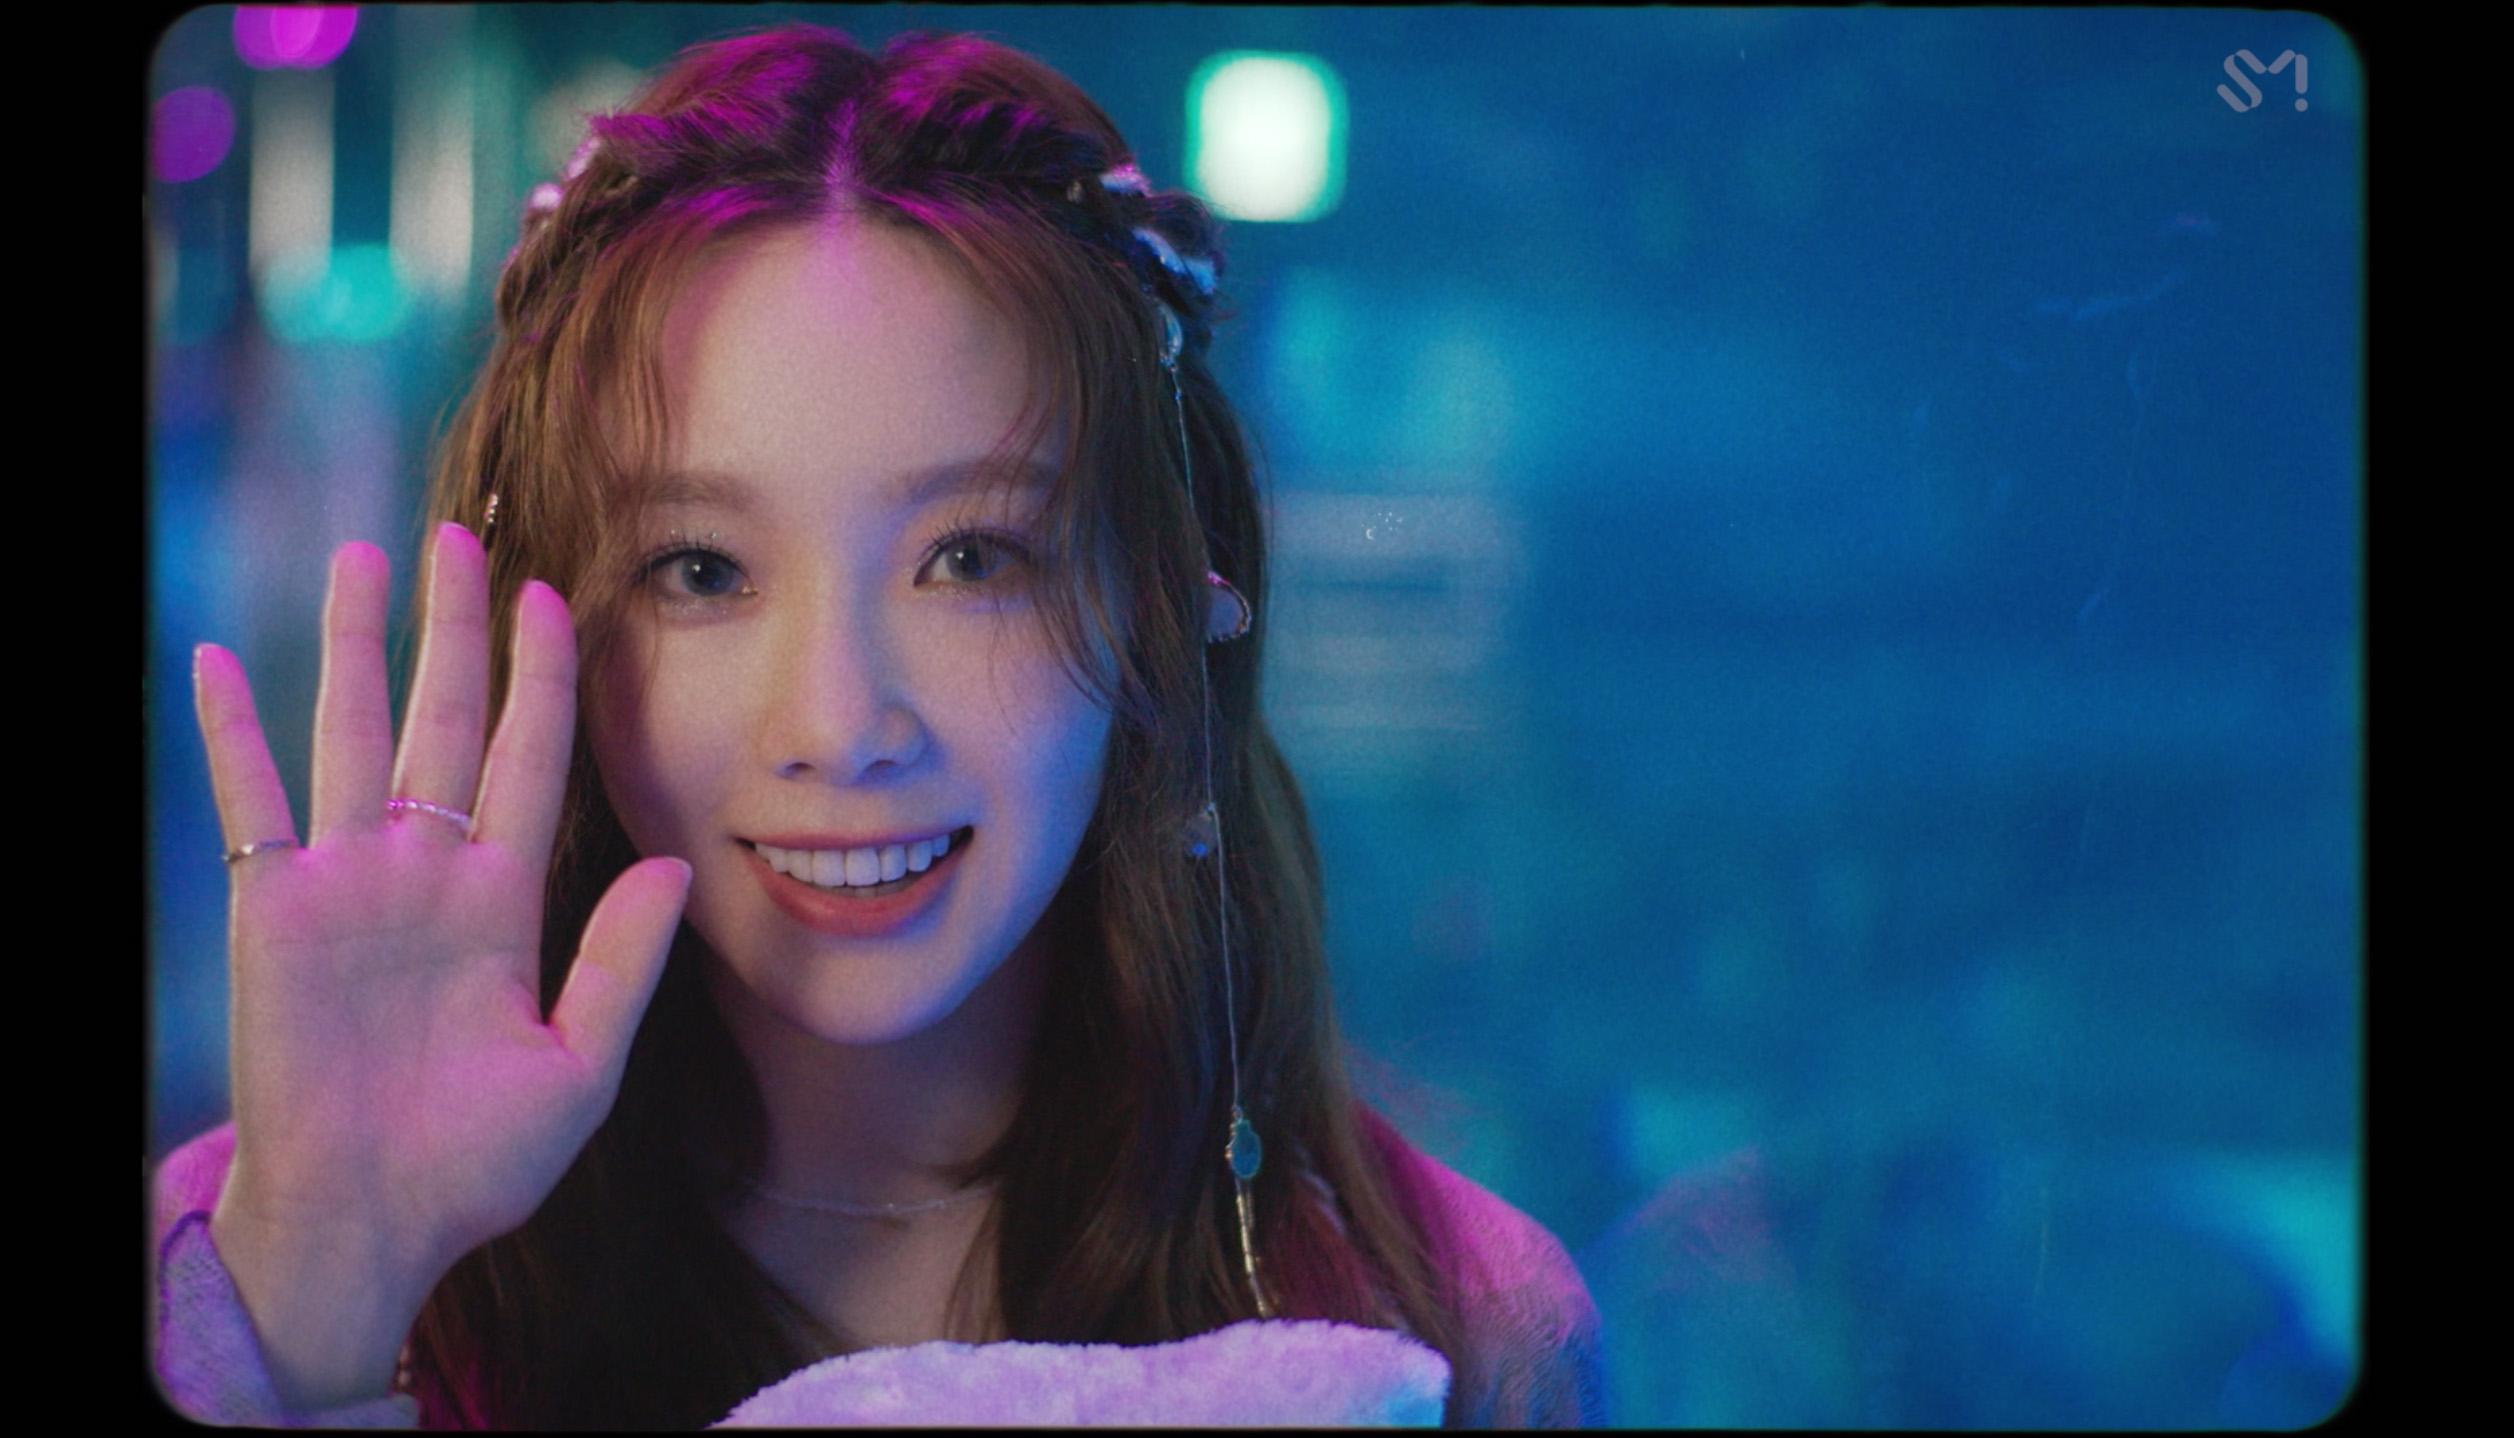 [STATION] TAEYEON 태연 #Happy Summer Interview #비하인더스테이션